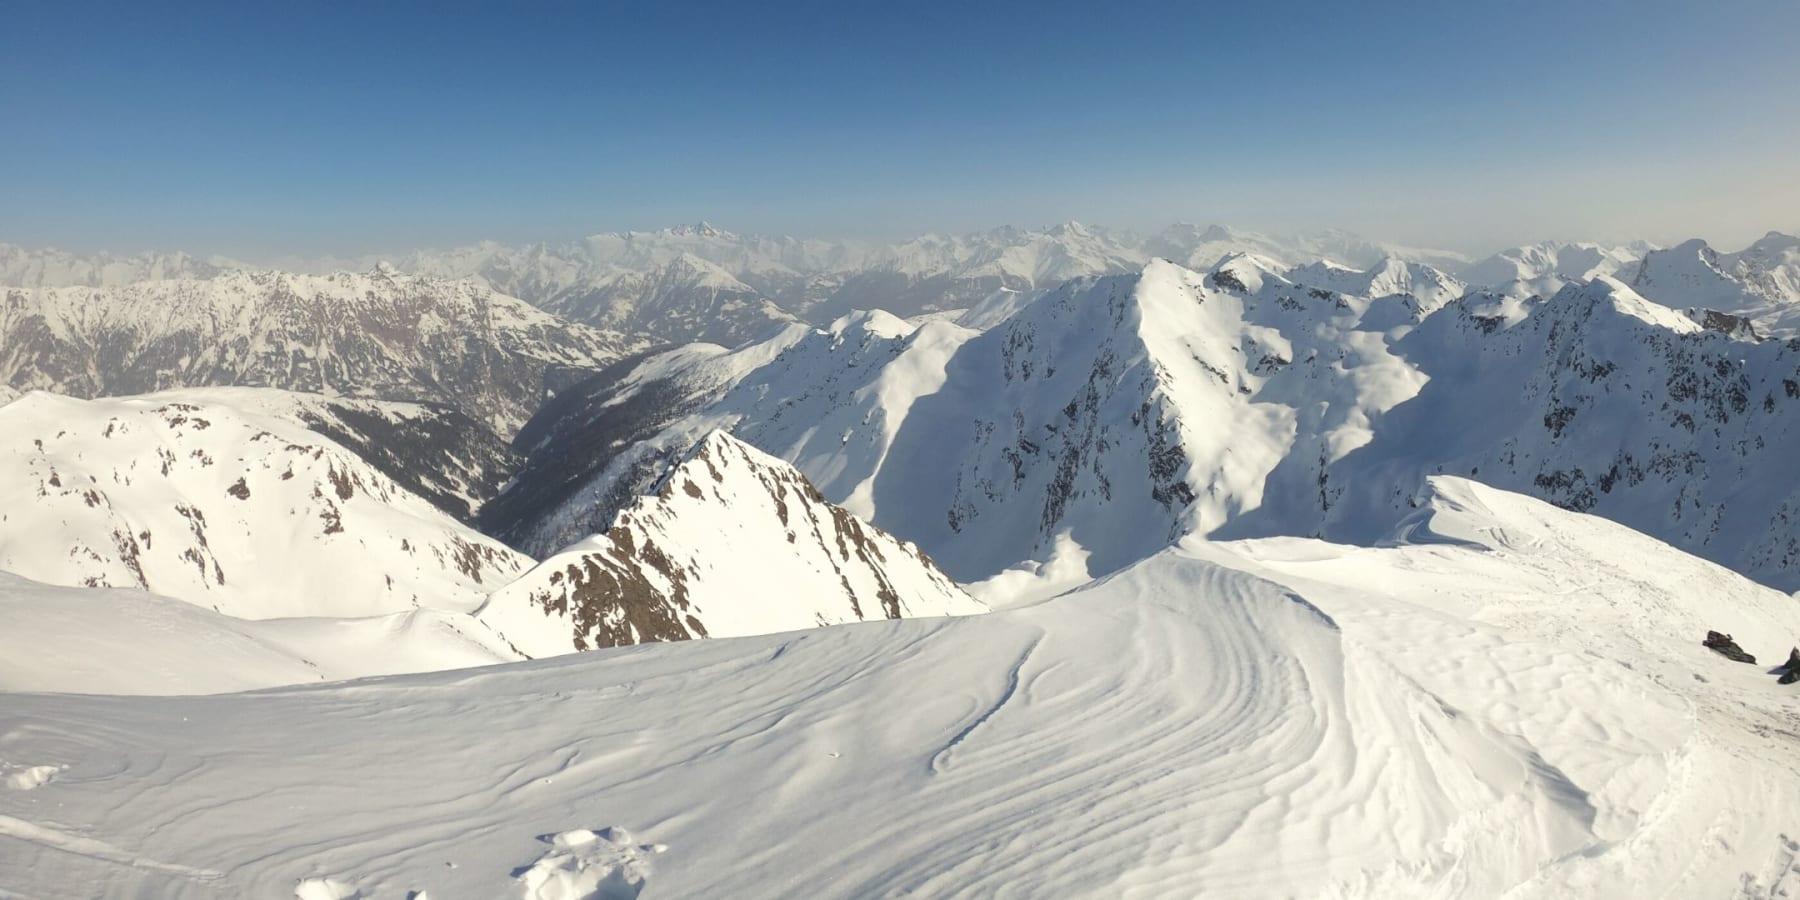 Skitouren-Paradies: Patscherkofel, skitour Patscherkofel